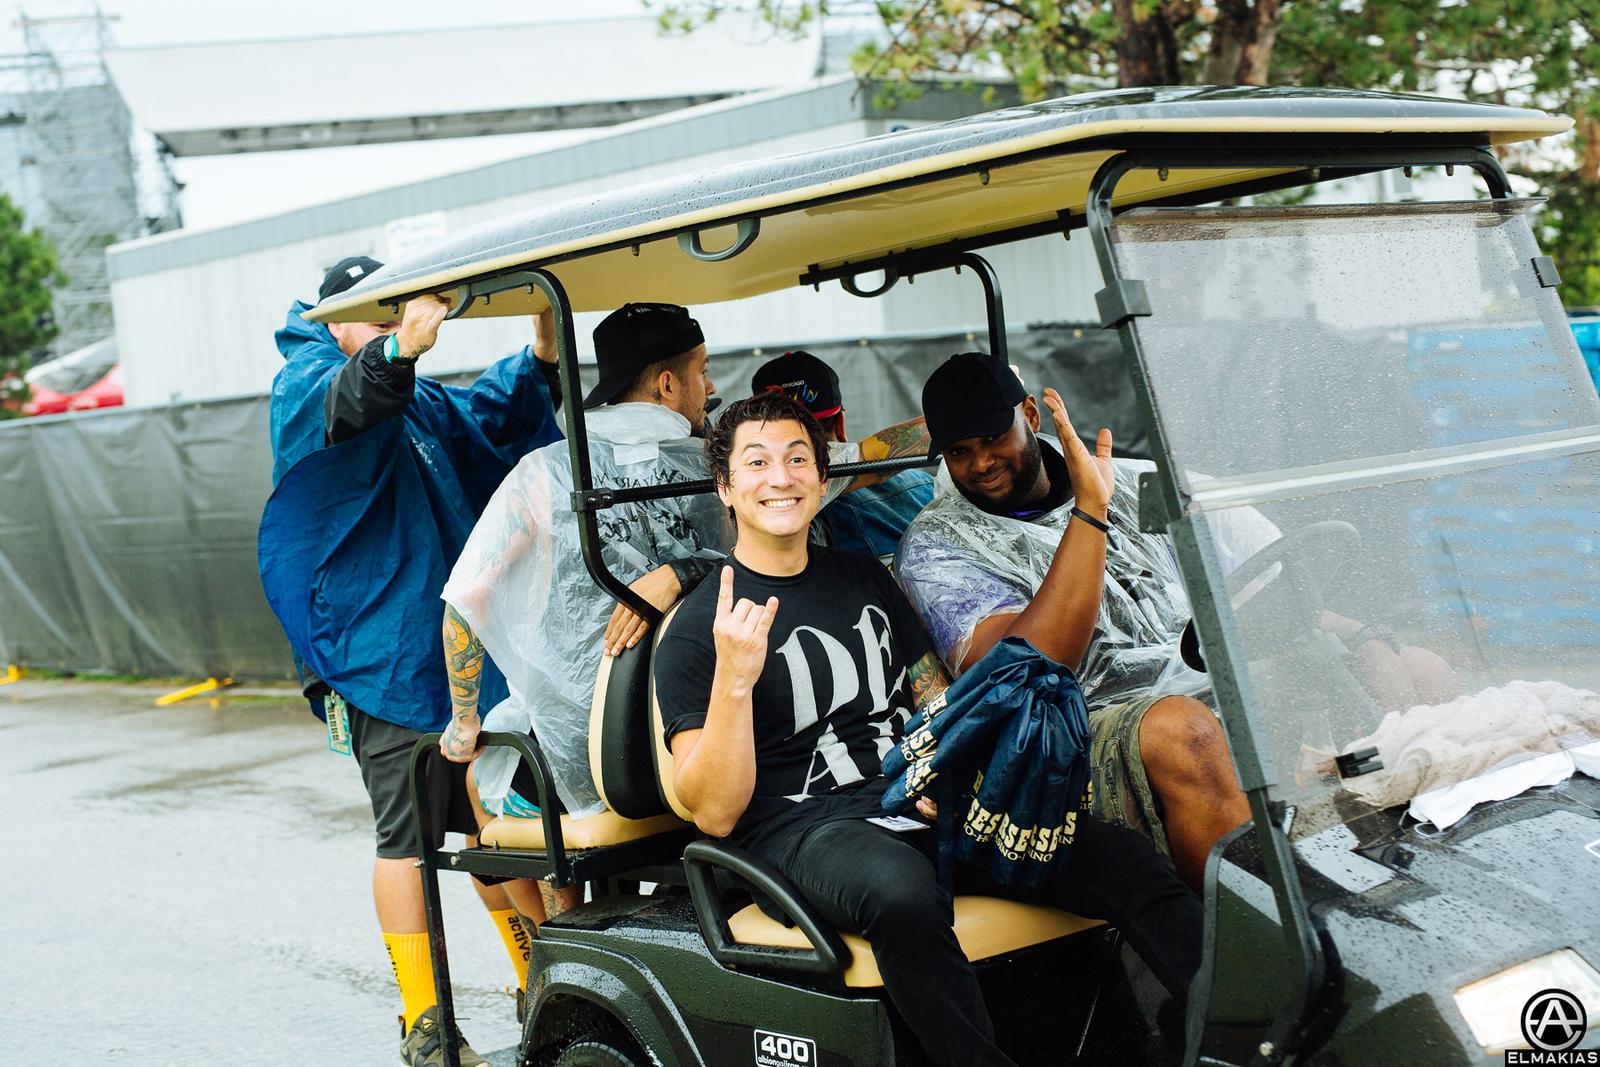 Pierce the Veil in a golf cart at Warped Tour 2015 by Adam Elmakias